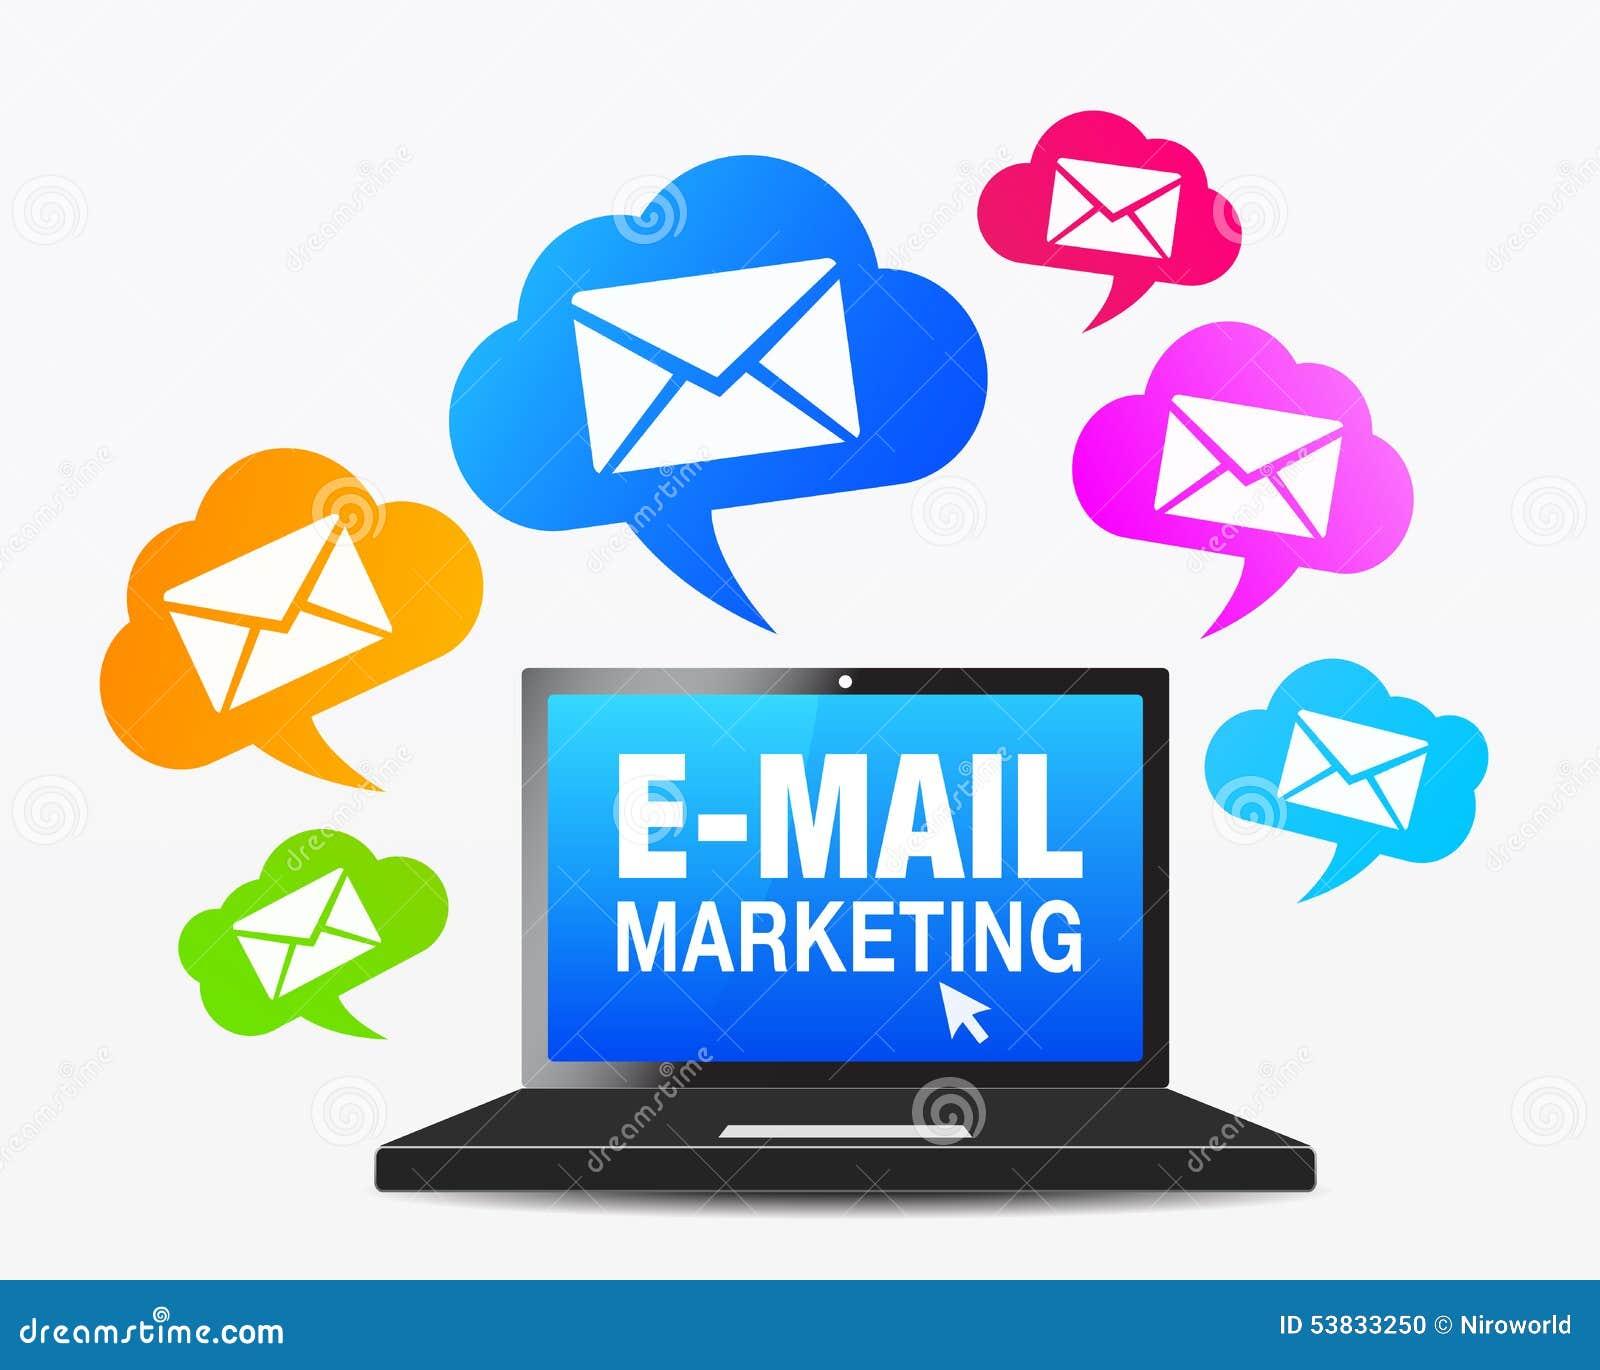 Web Email Marketing Icons